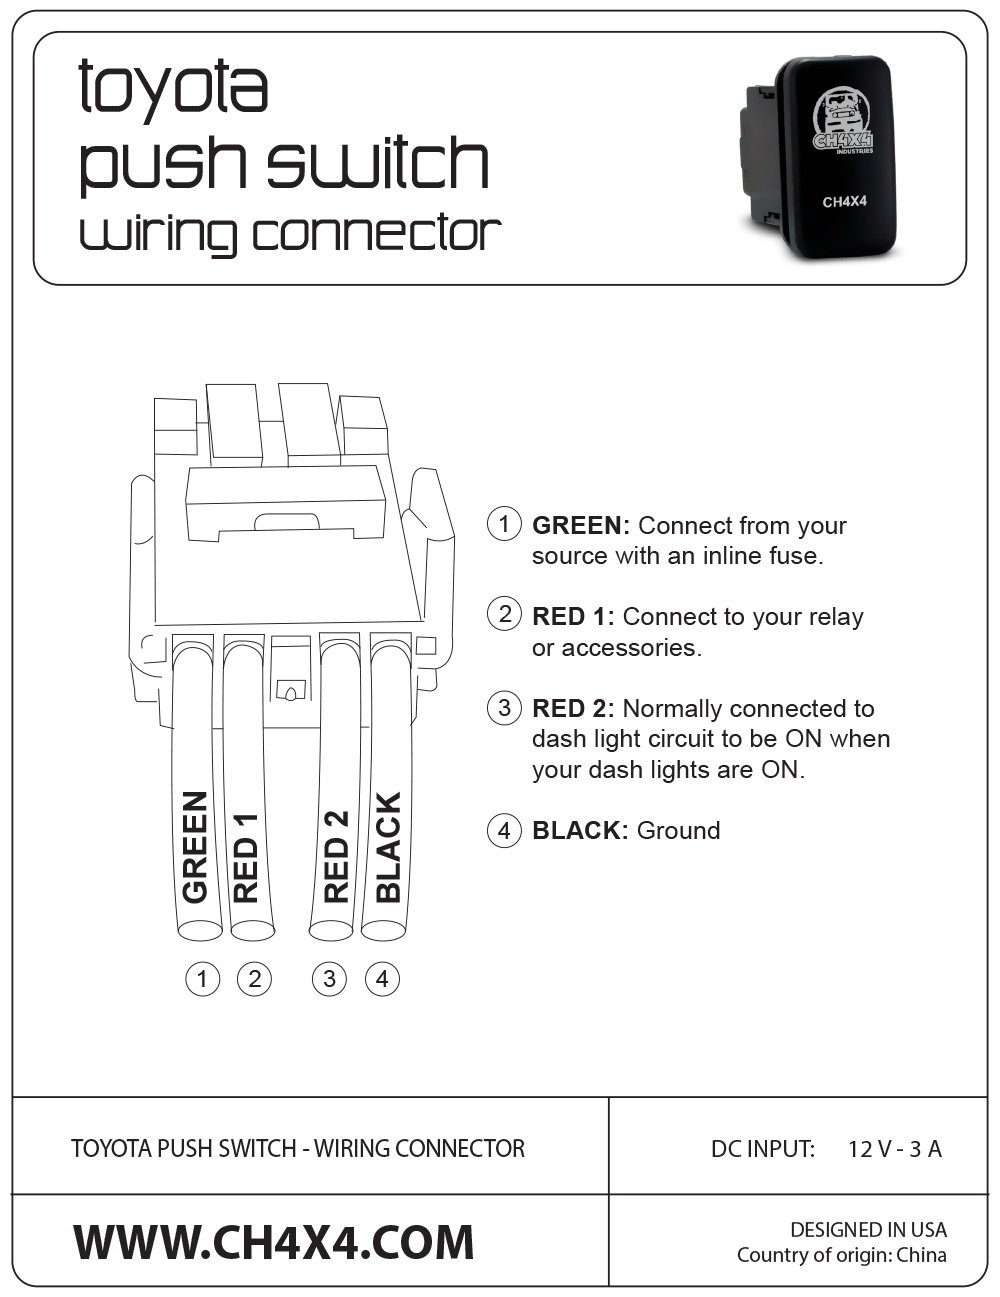 CH4x4 Toyota Push Switch Tacoma 3rd Gen Led Light Bar Symbol 2 - Blue LED